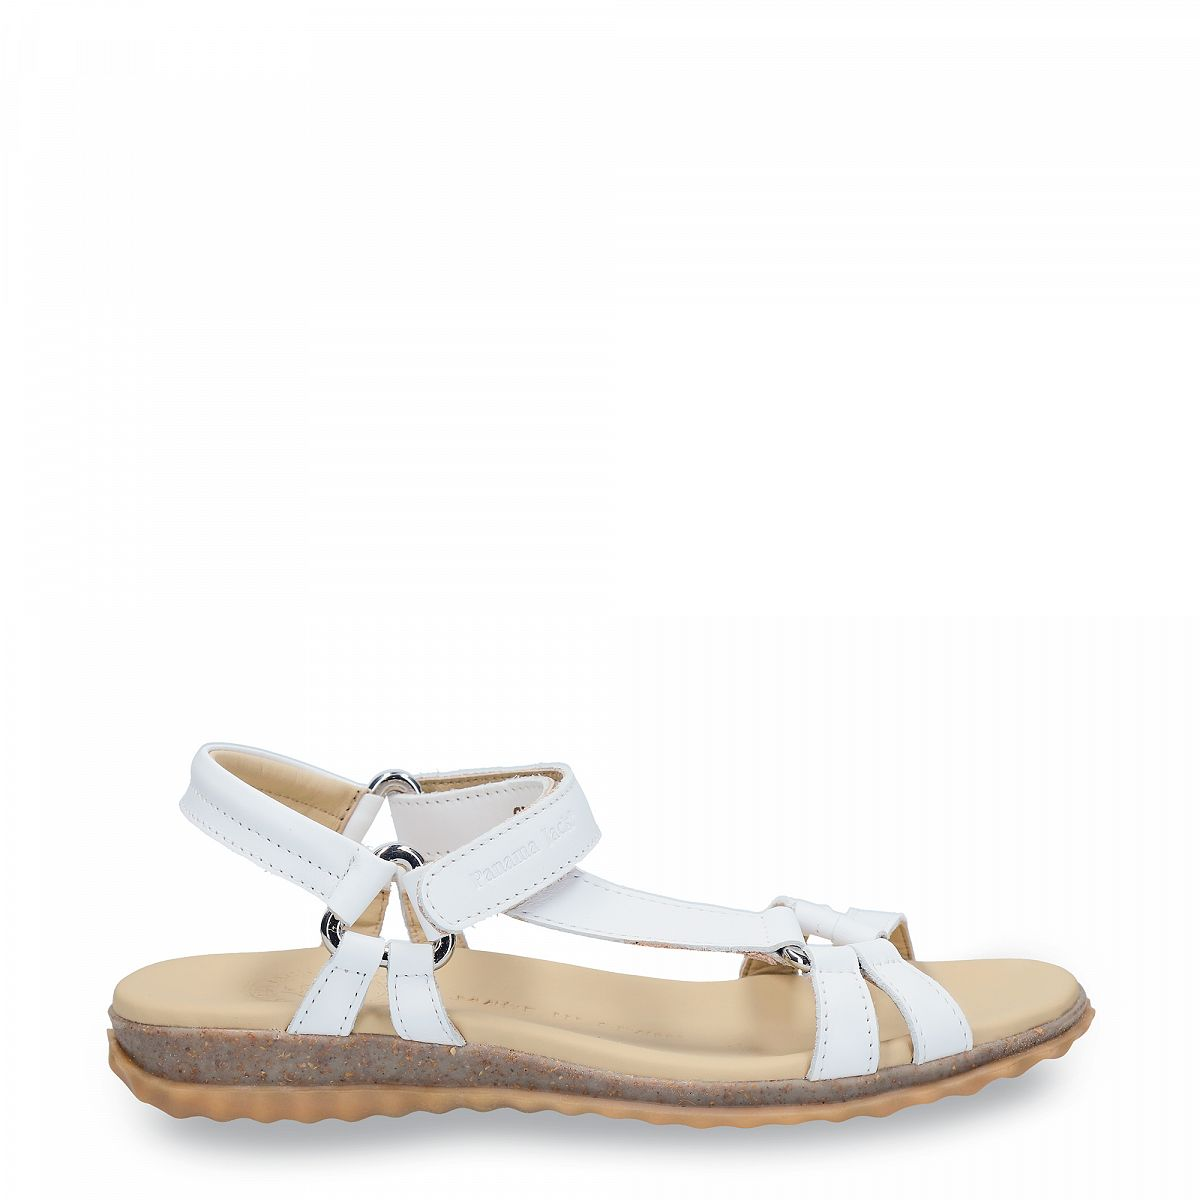 Caribbean White Napa